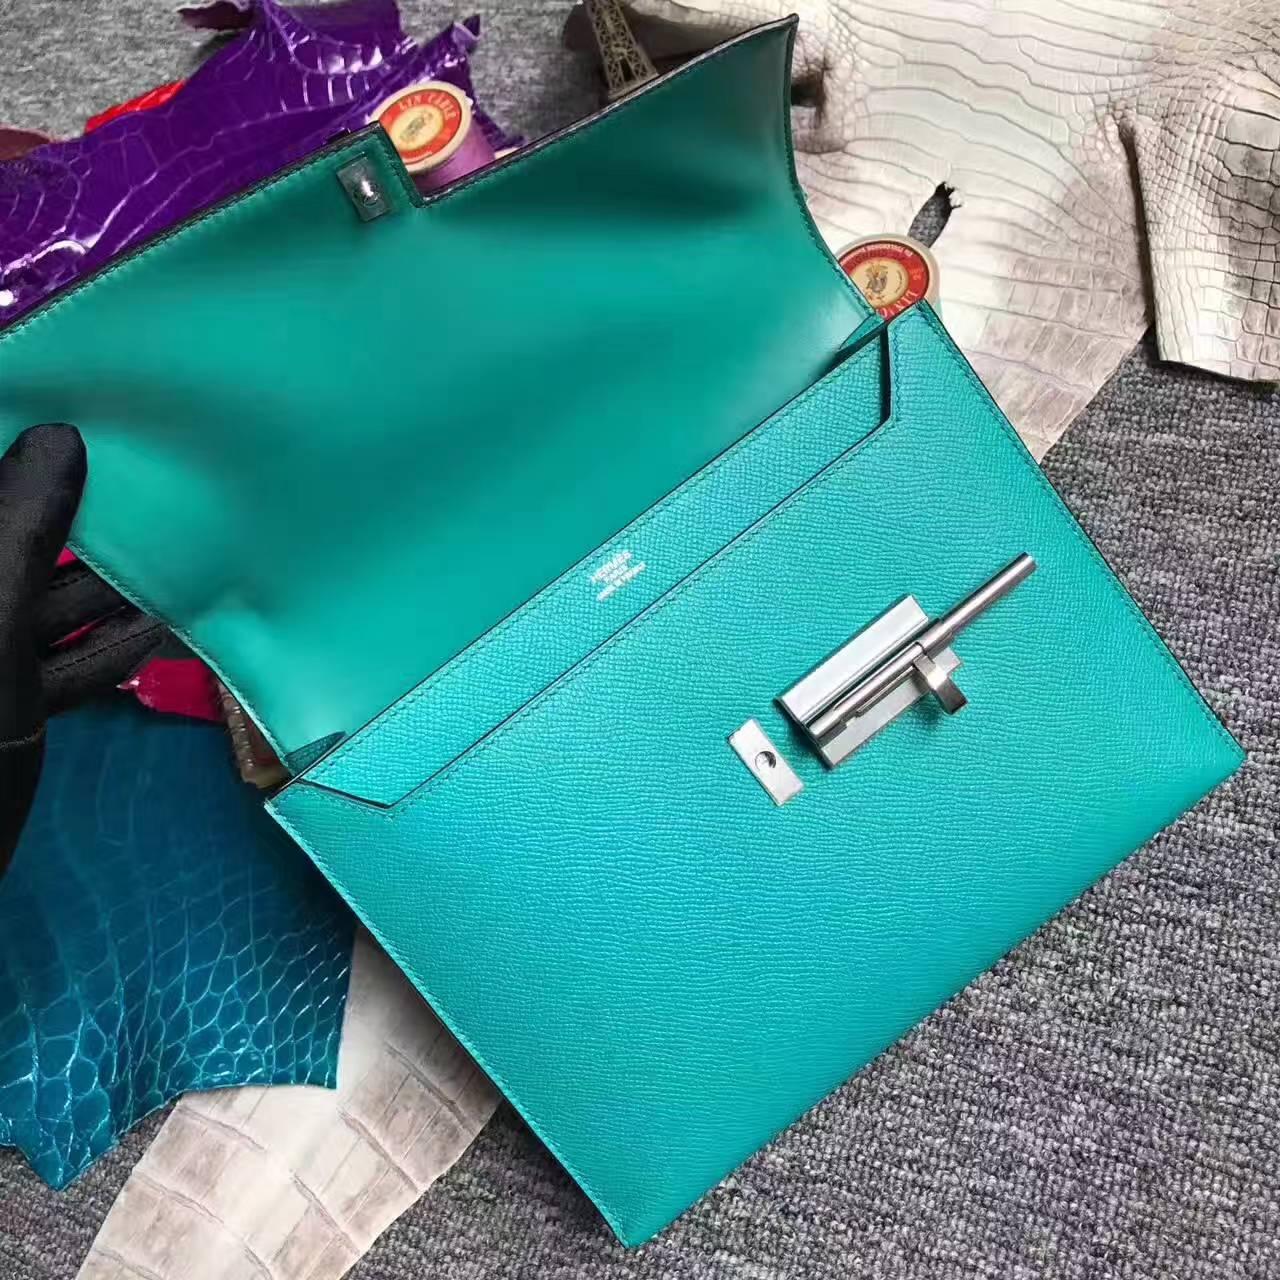 High Quality Hermes 7F Blue Paon Epsom Leather Verrou Bag 24cm